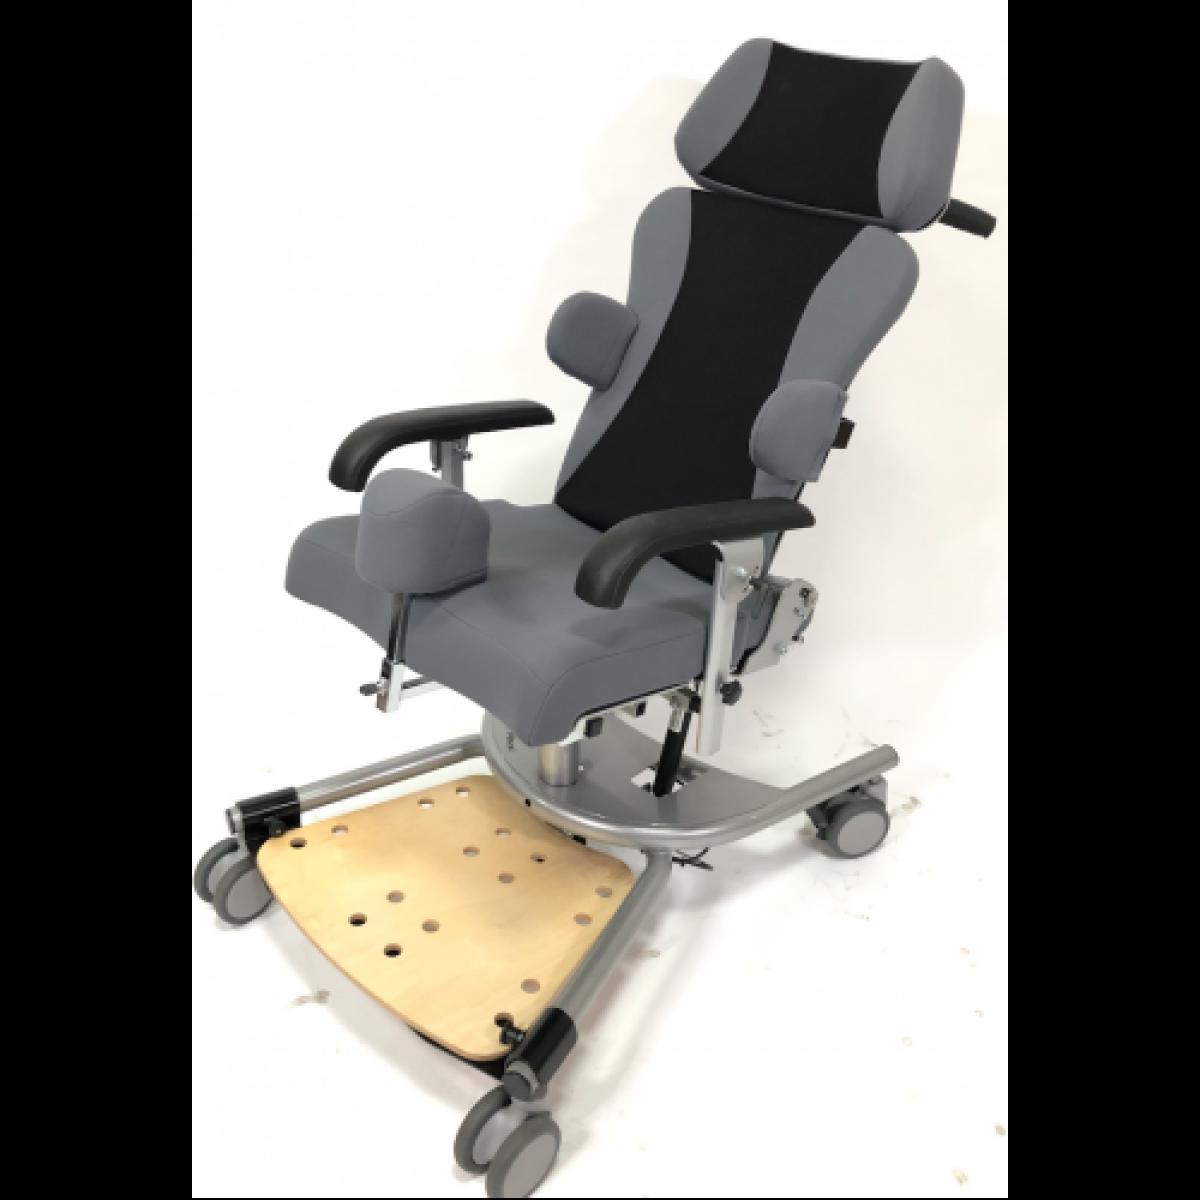 Кресло комнатное реабилитационное Schuchmann Madita Maxi